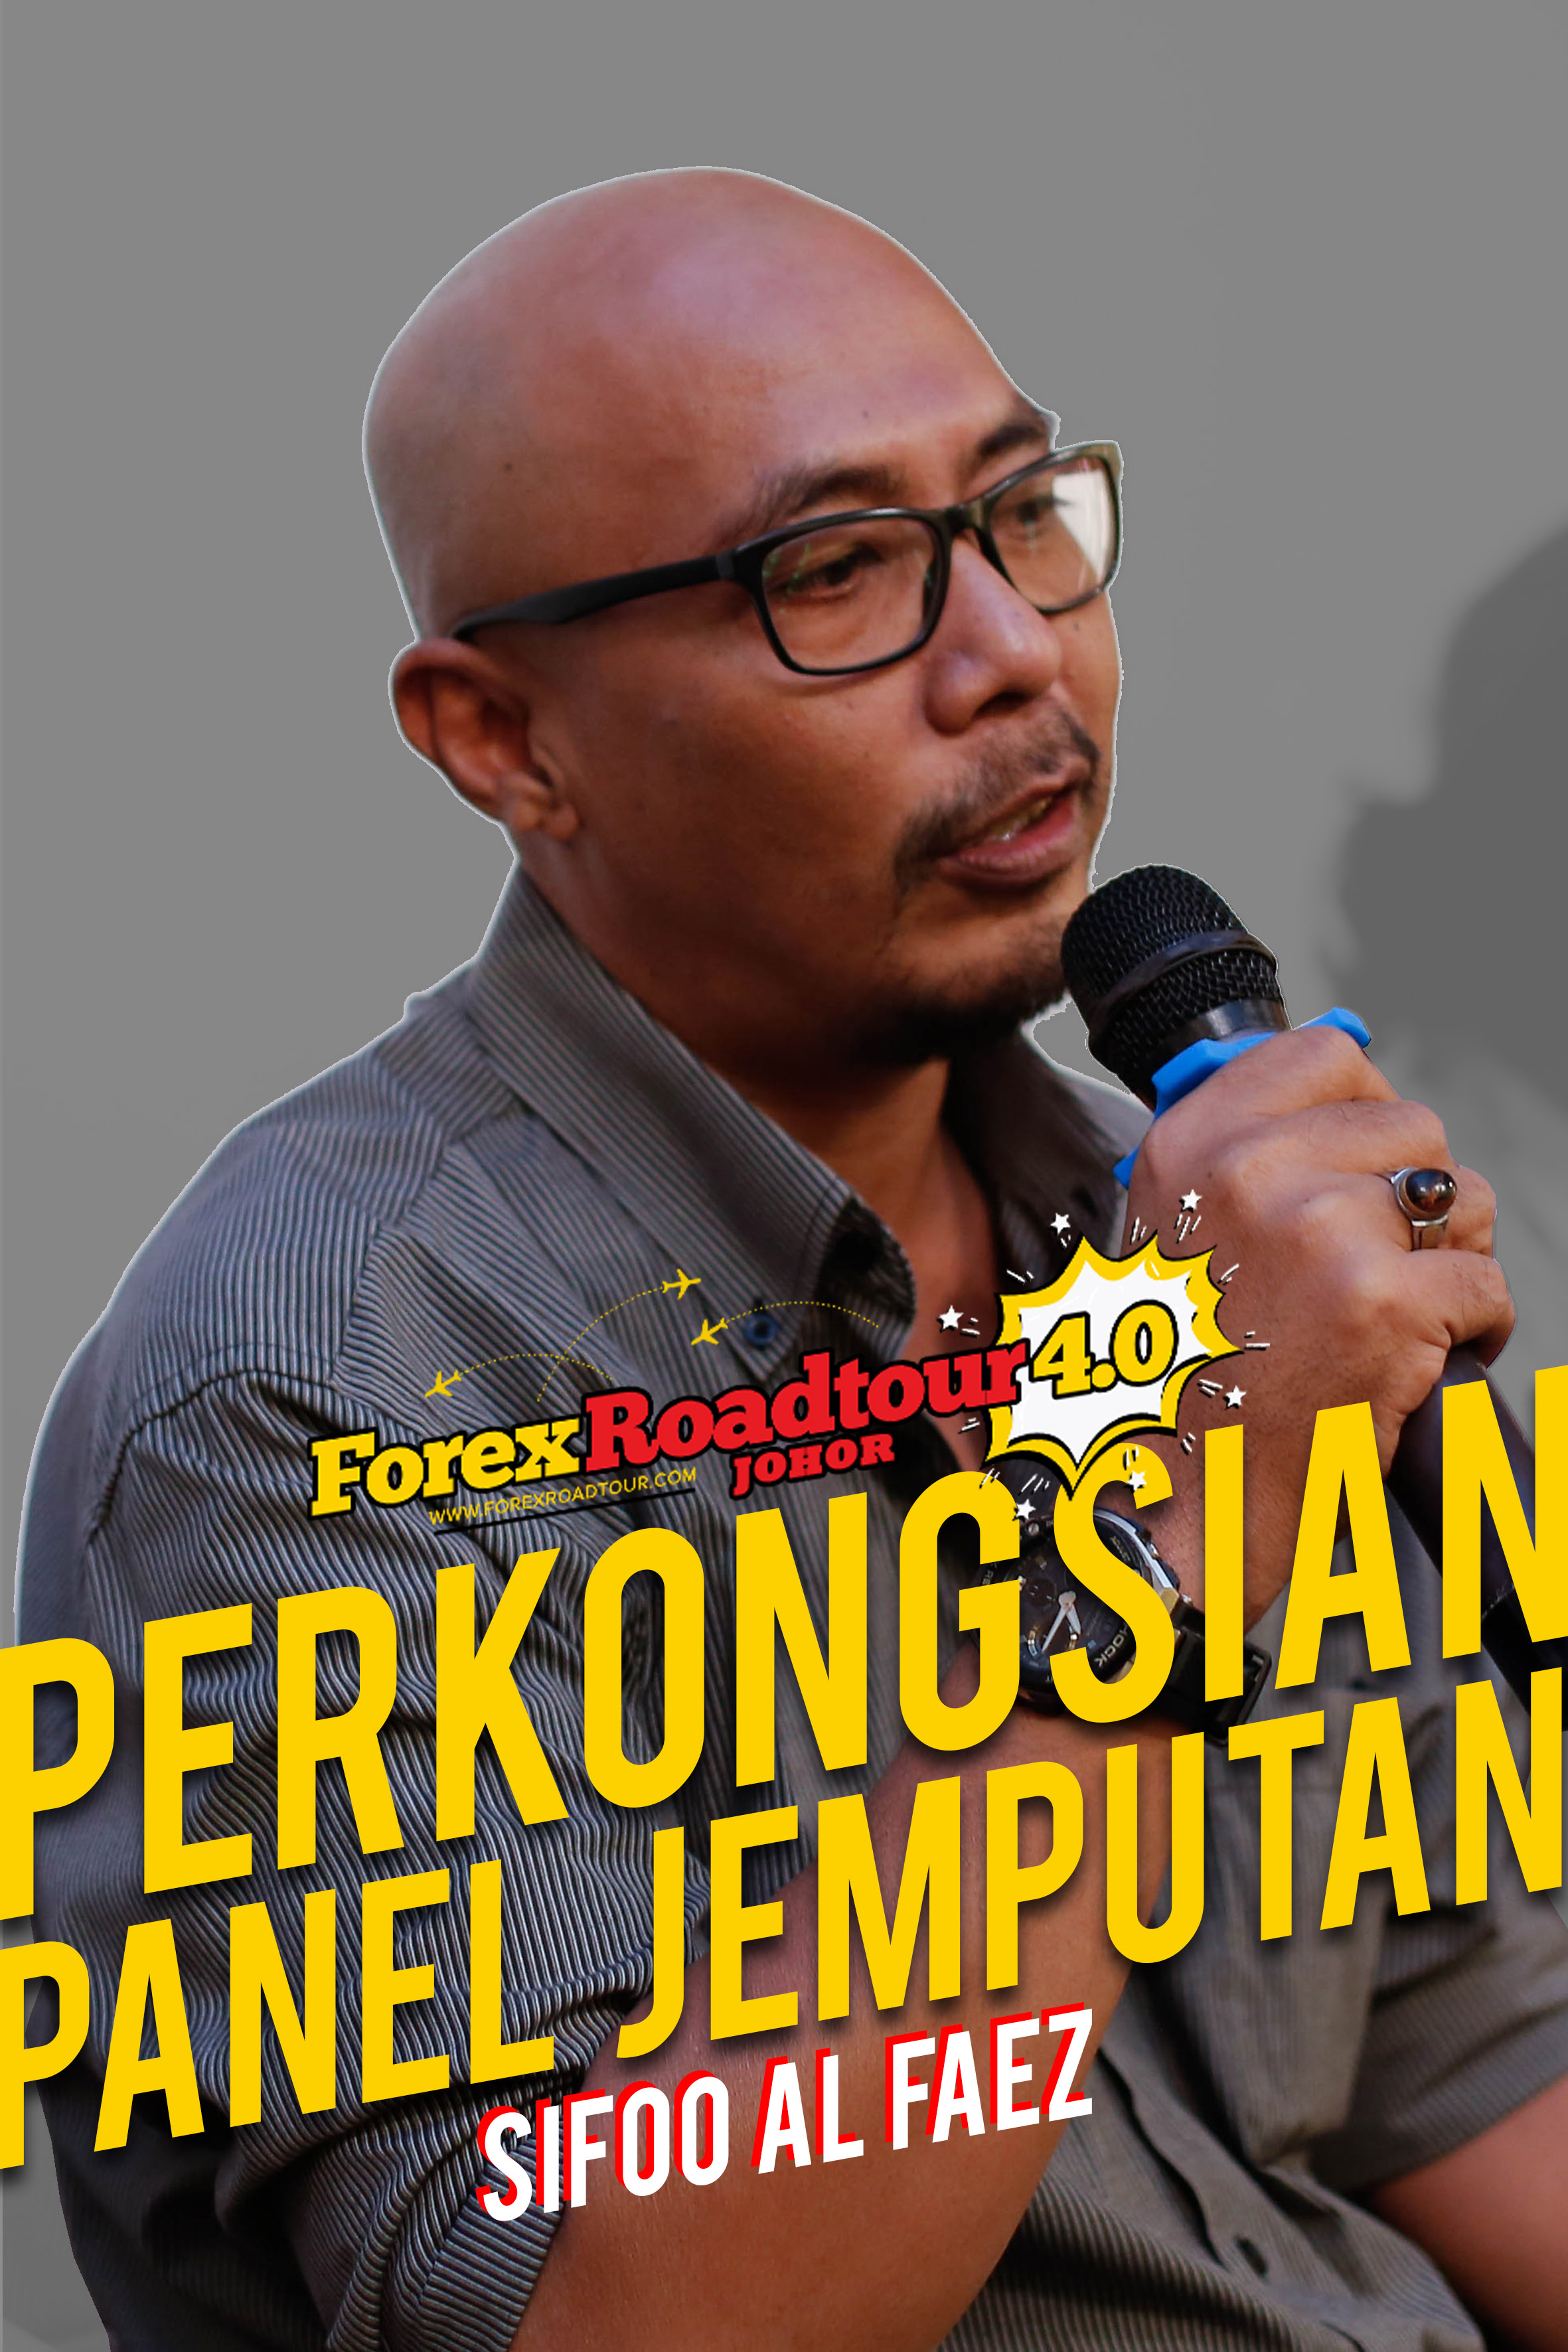 Sifoo AL Faez [Forex Road Tour 4.0 Johor]